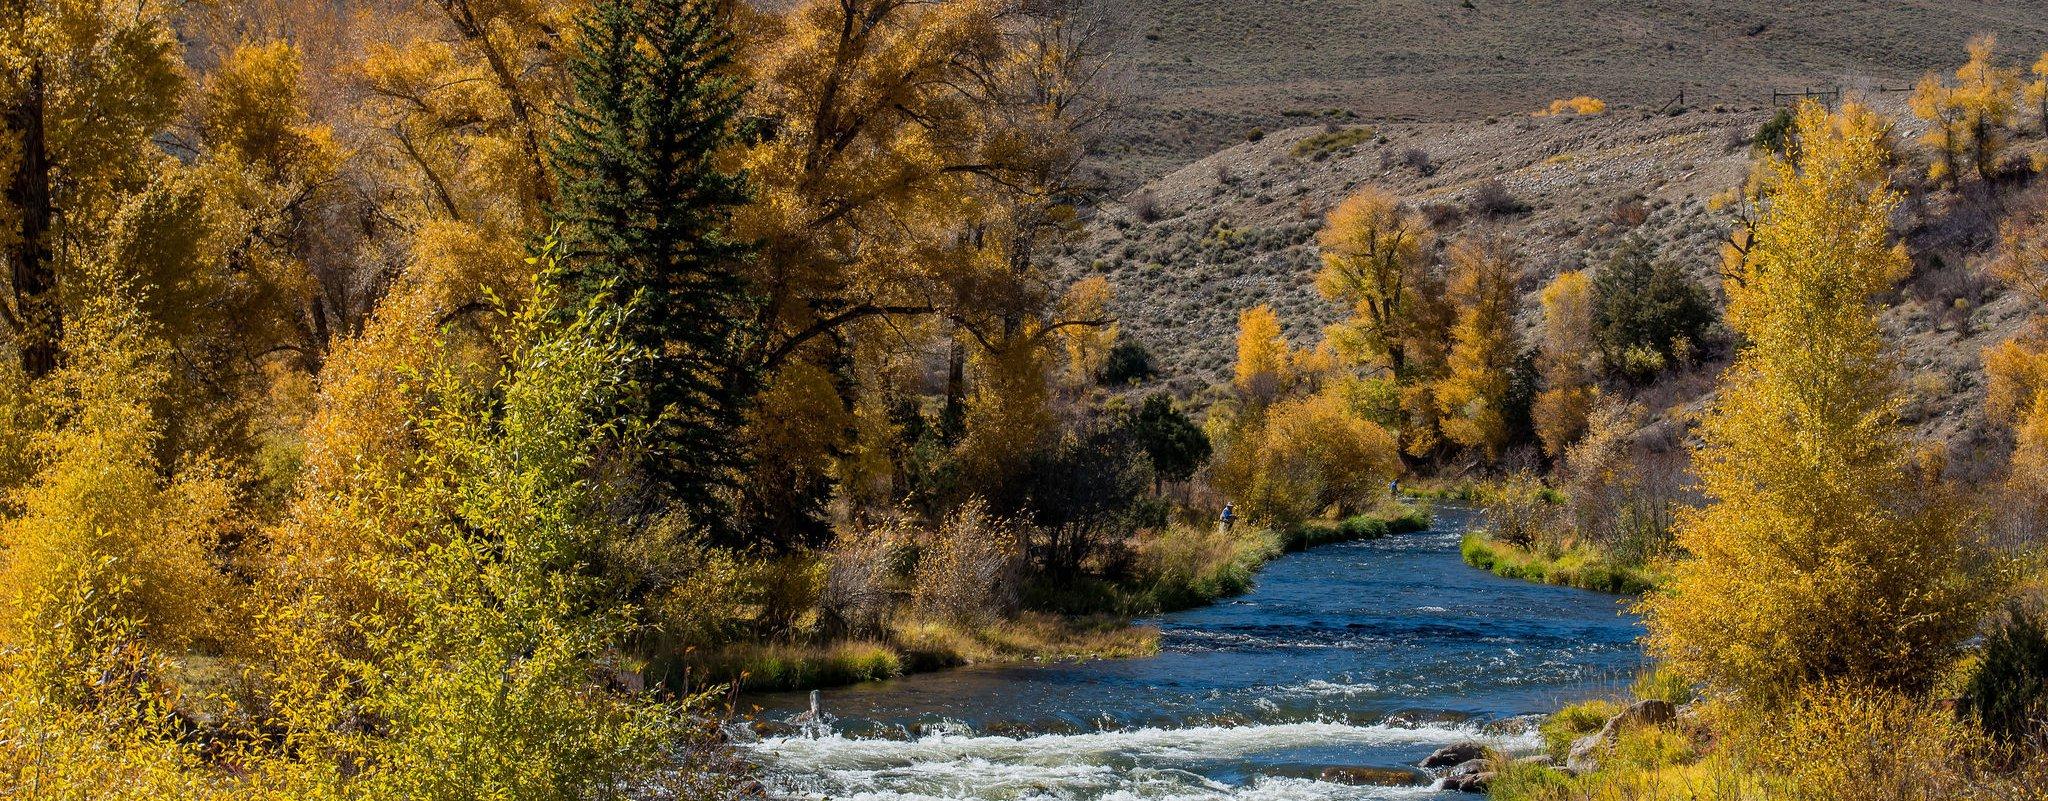 Williams Fork River